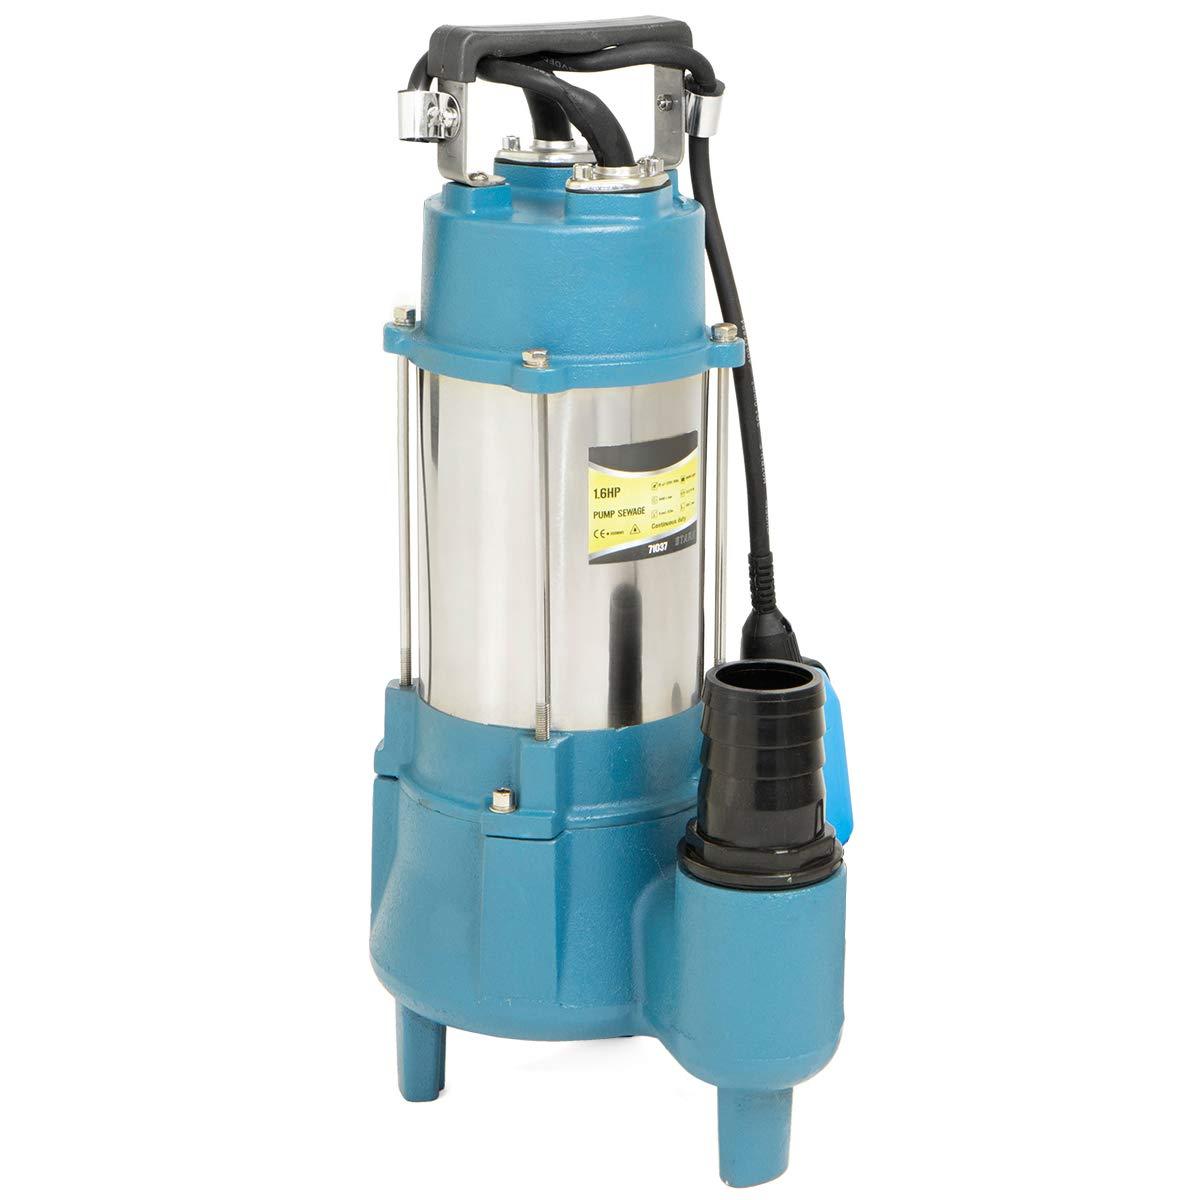 Stark 1.5HP Submersible Sewage Pump 7100 GPH Stainless Steel Heavy Duty Float Switch Garden Sprinkler 1'' inch Outlet, 220V by Stark USA